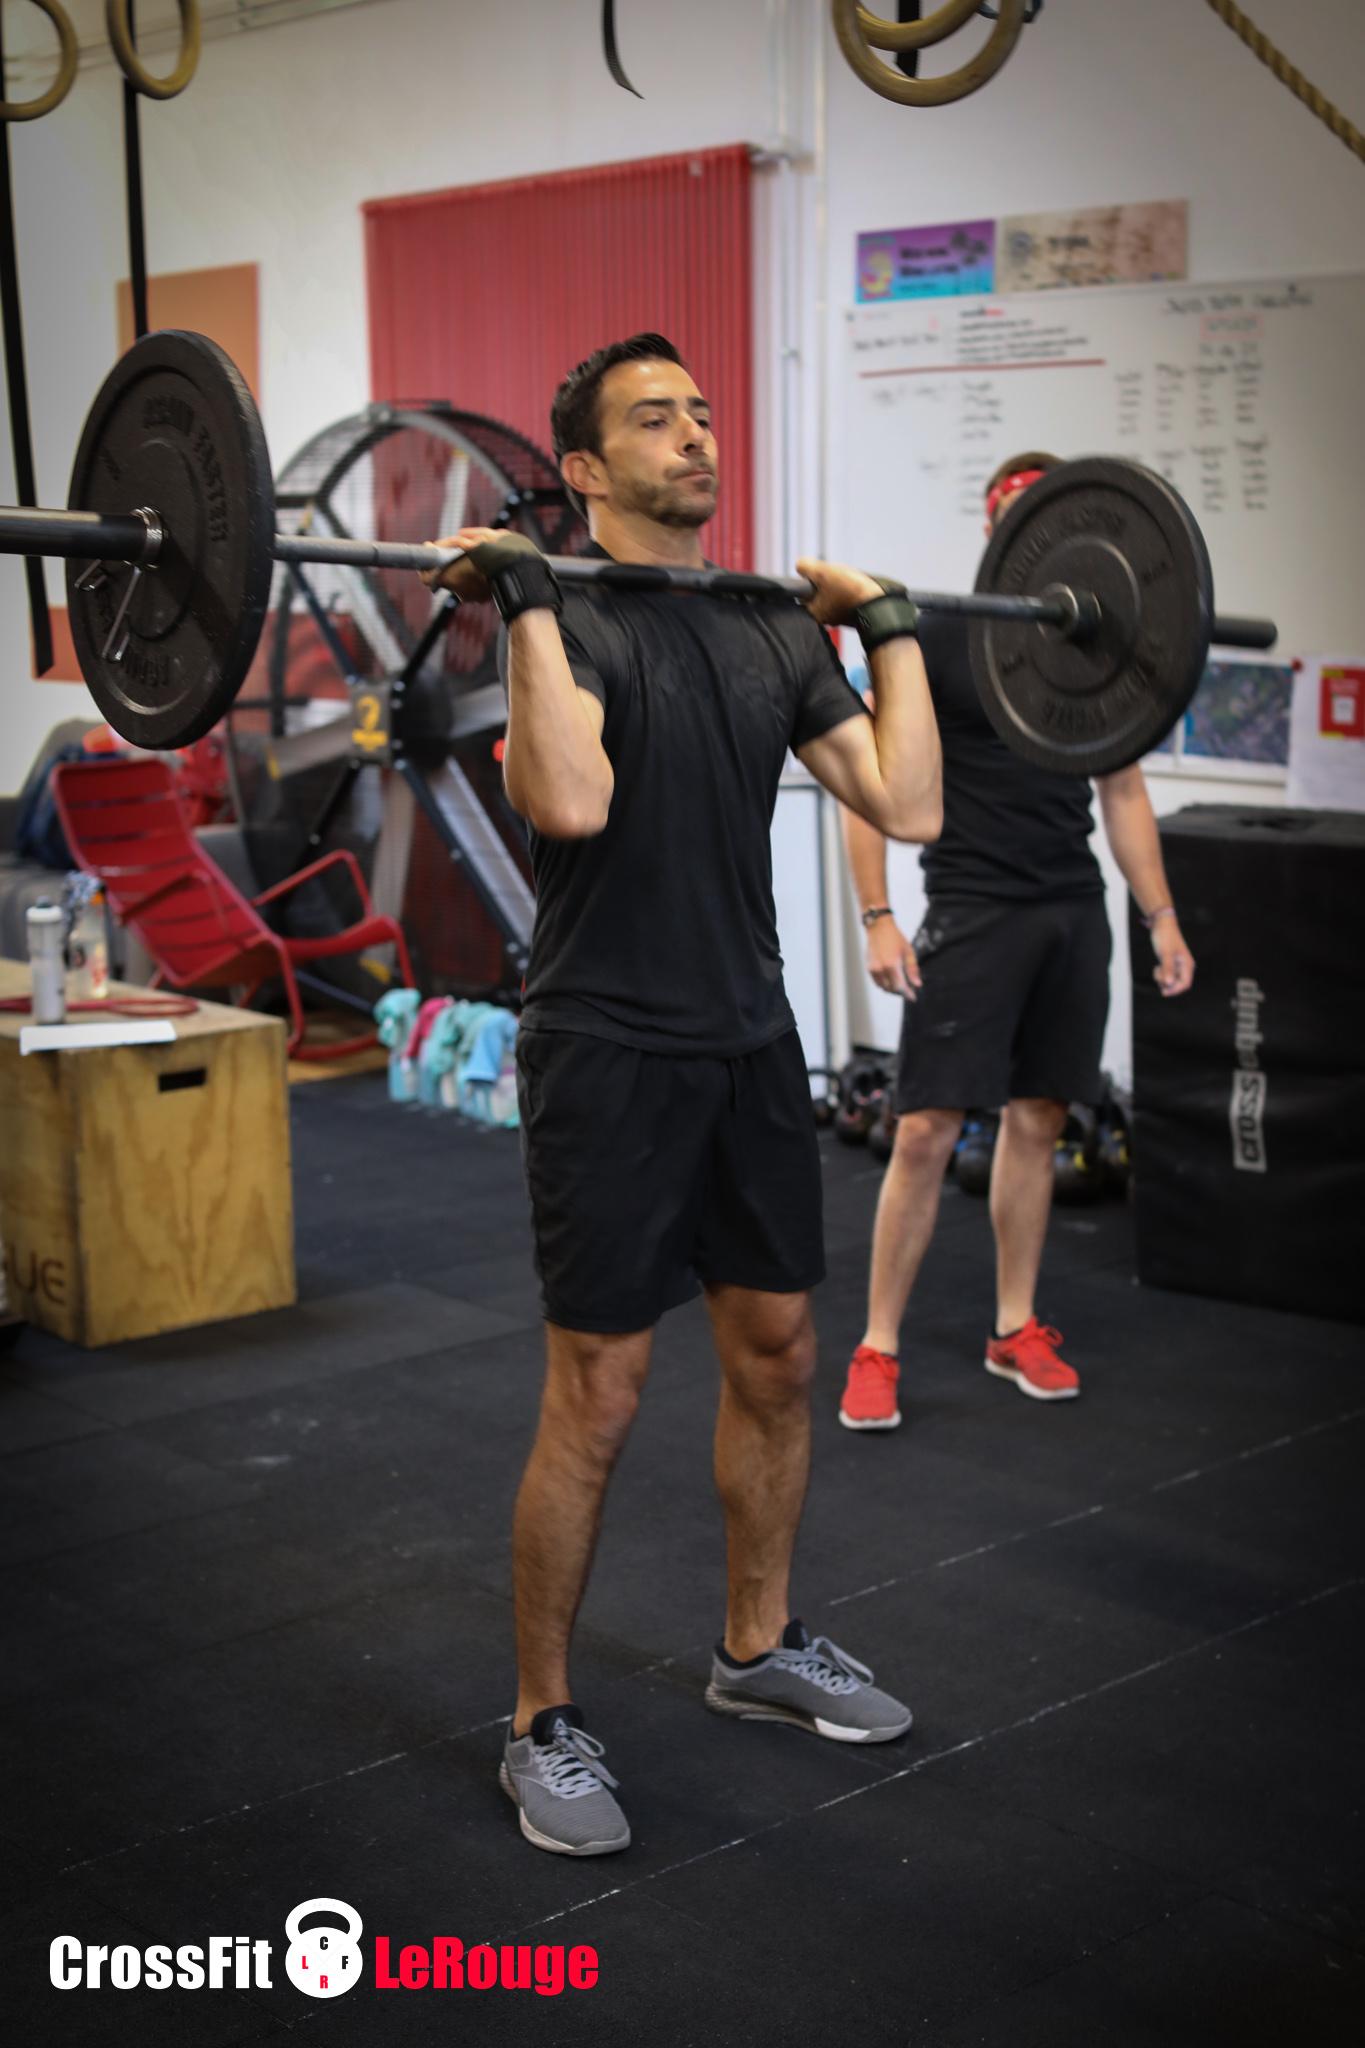 CrossFit WOD push-press + shoulders